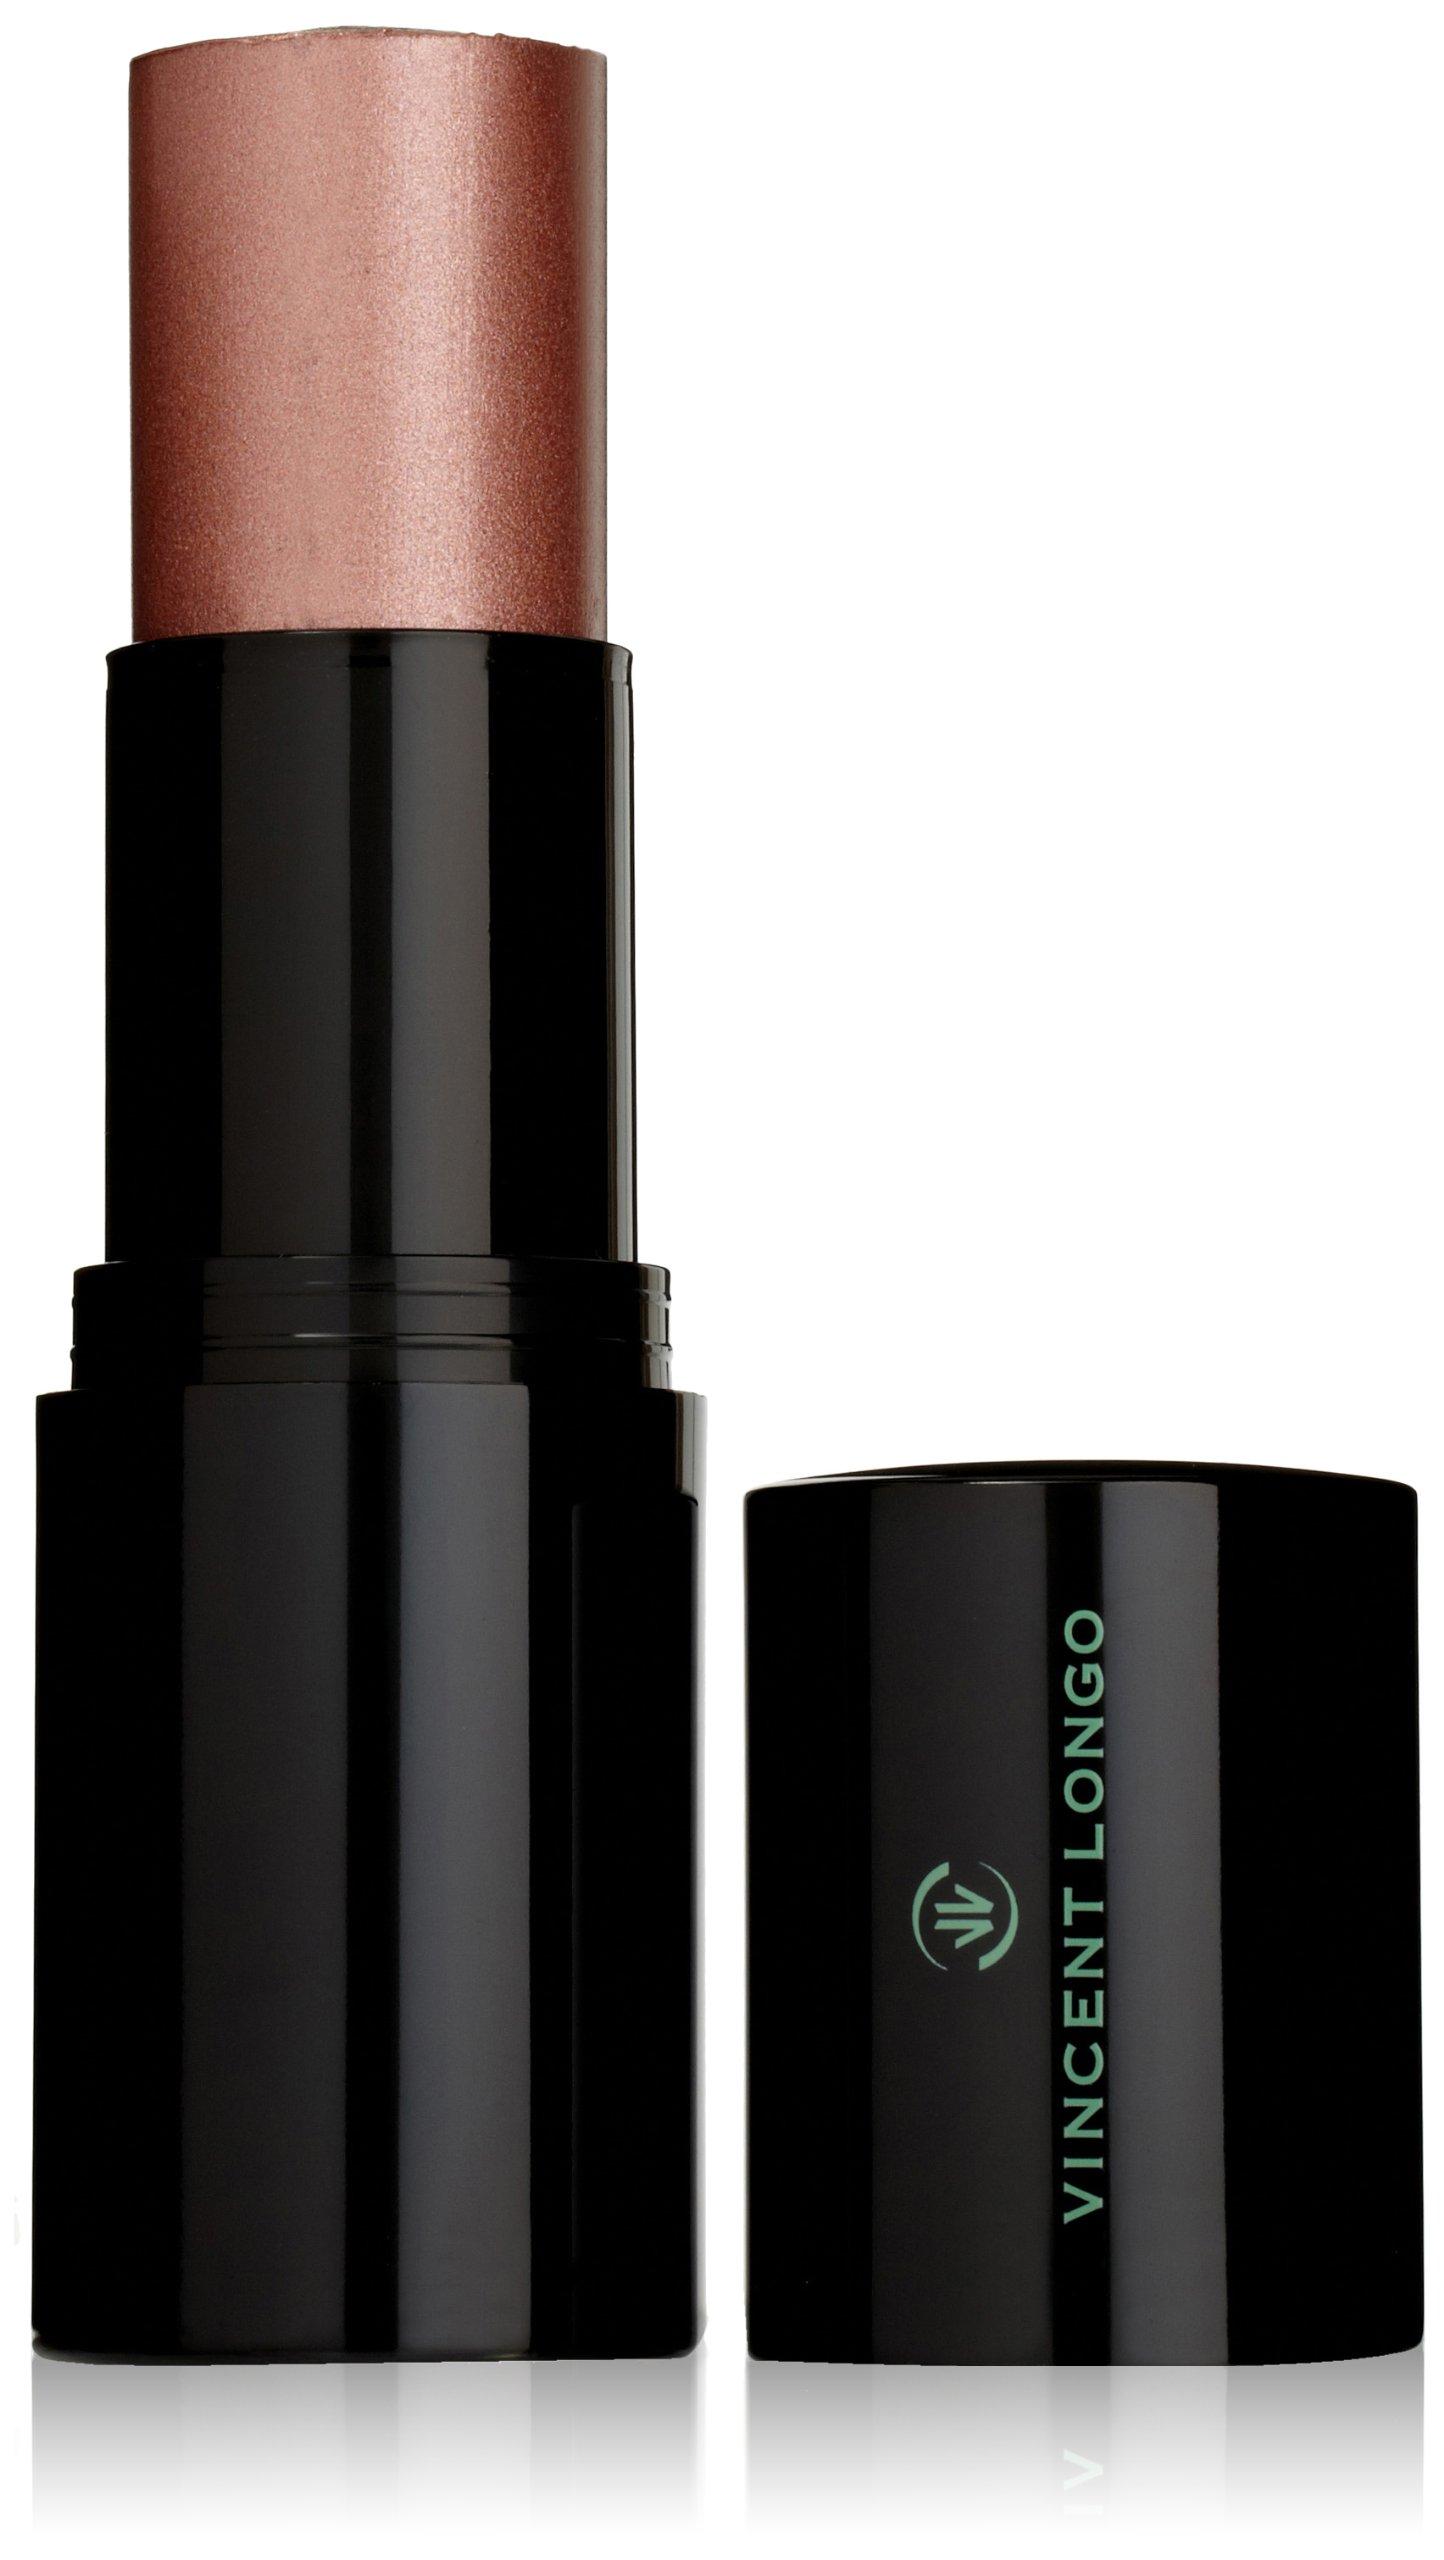 Sheer Pigment Lipstick by vincent longo #14